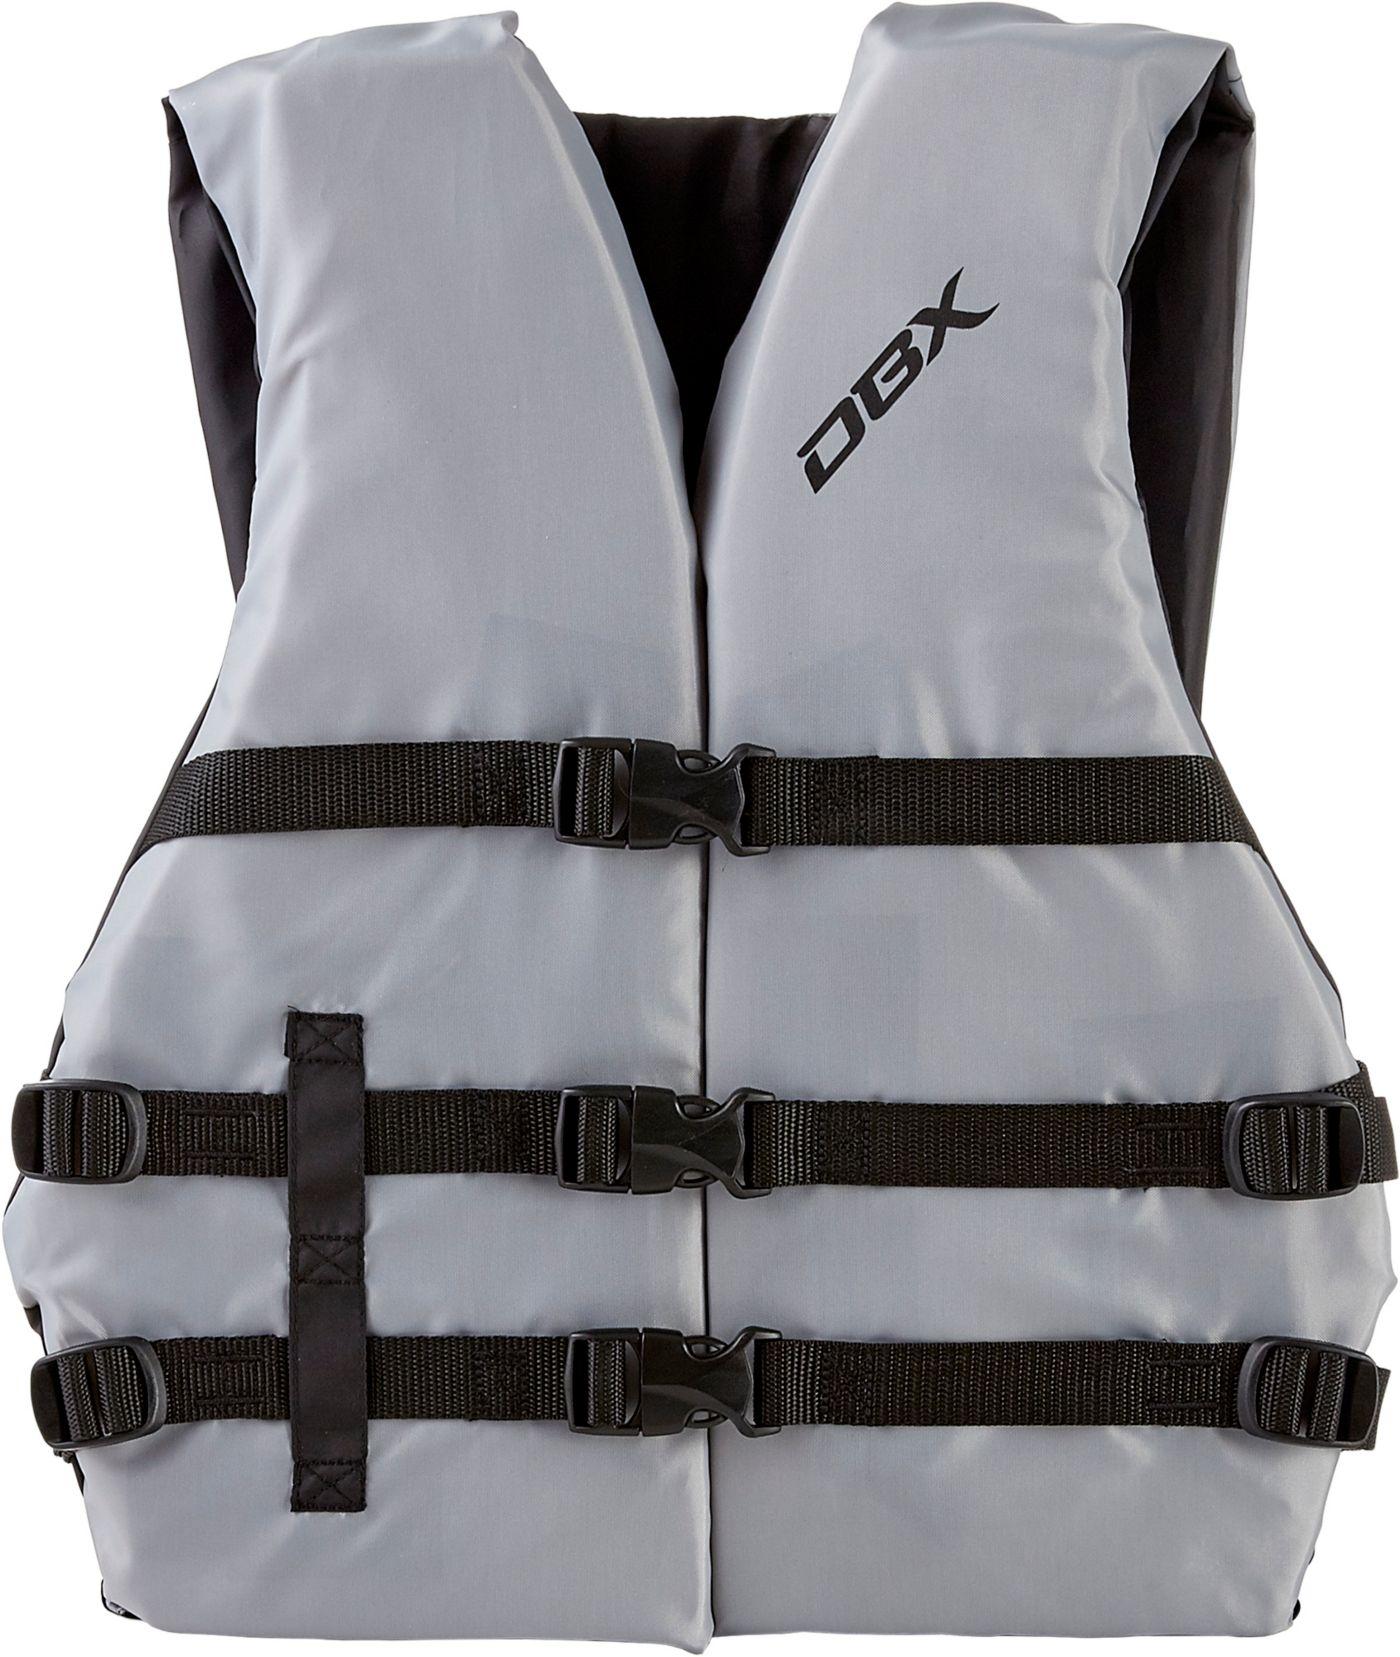 DBX Adult Universal Type III Nylon Life Vest